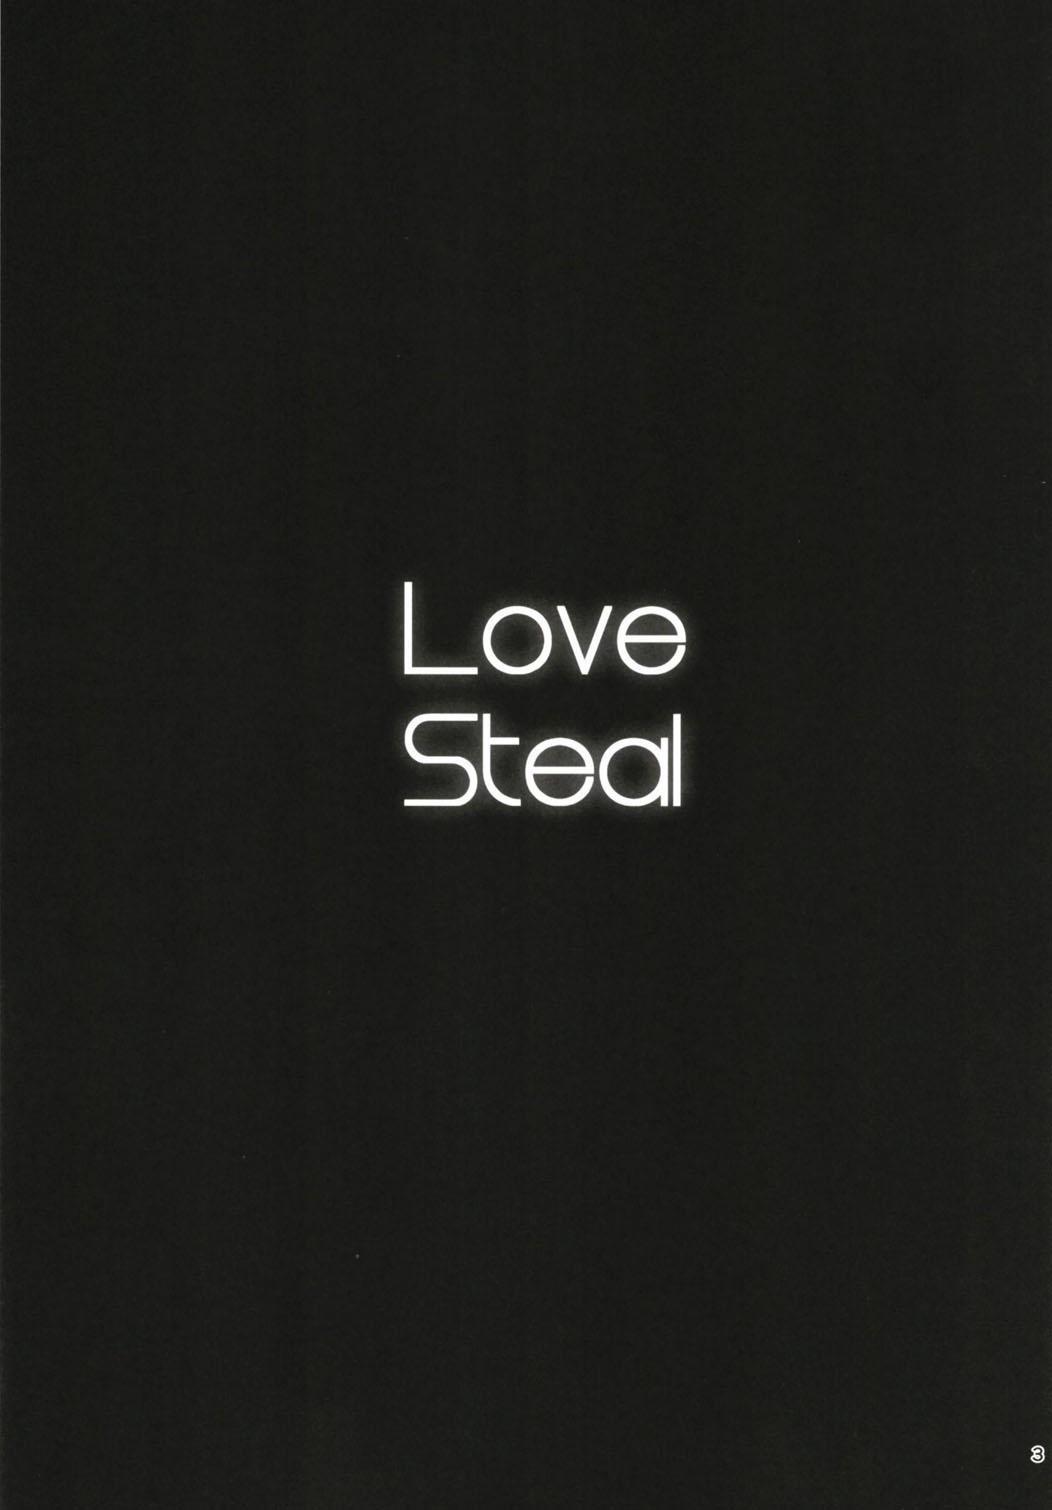 Love Steal 2